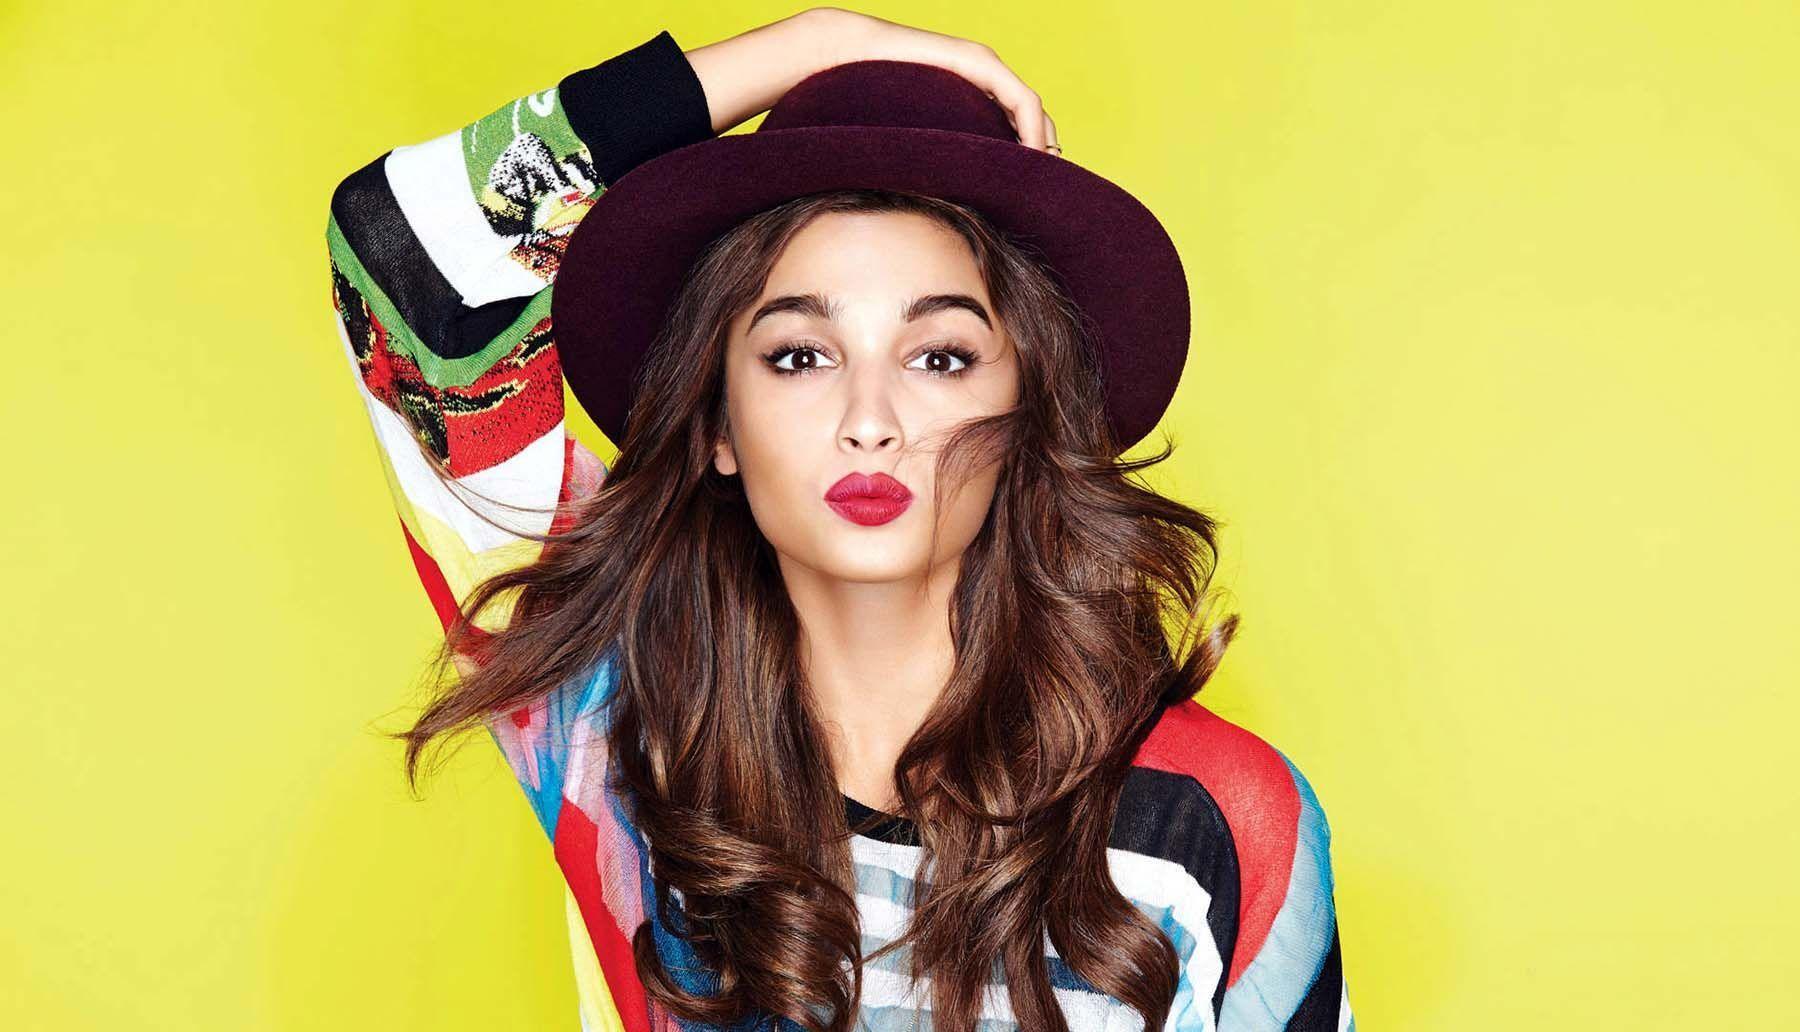 Alia Bhatt 4K Wallpapers - Top Free Alia Bhatt 4K Backgrounds -  WallpaperAccess